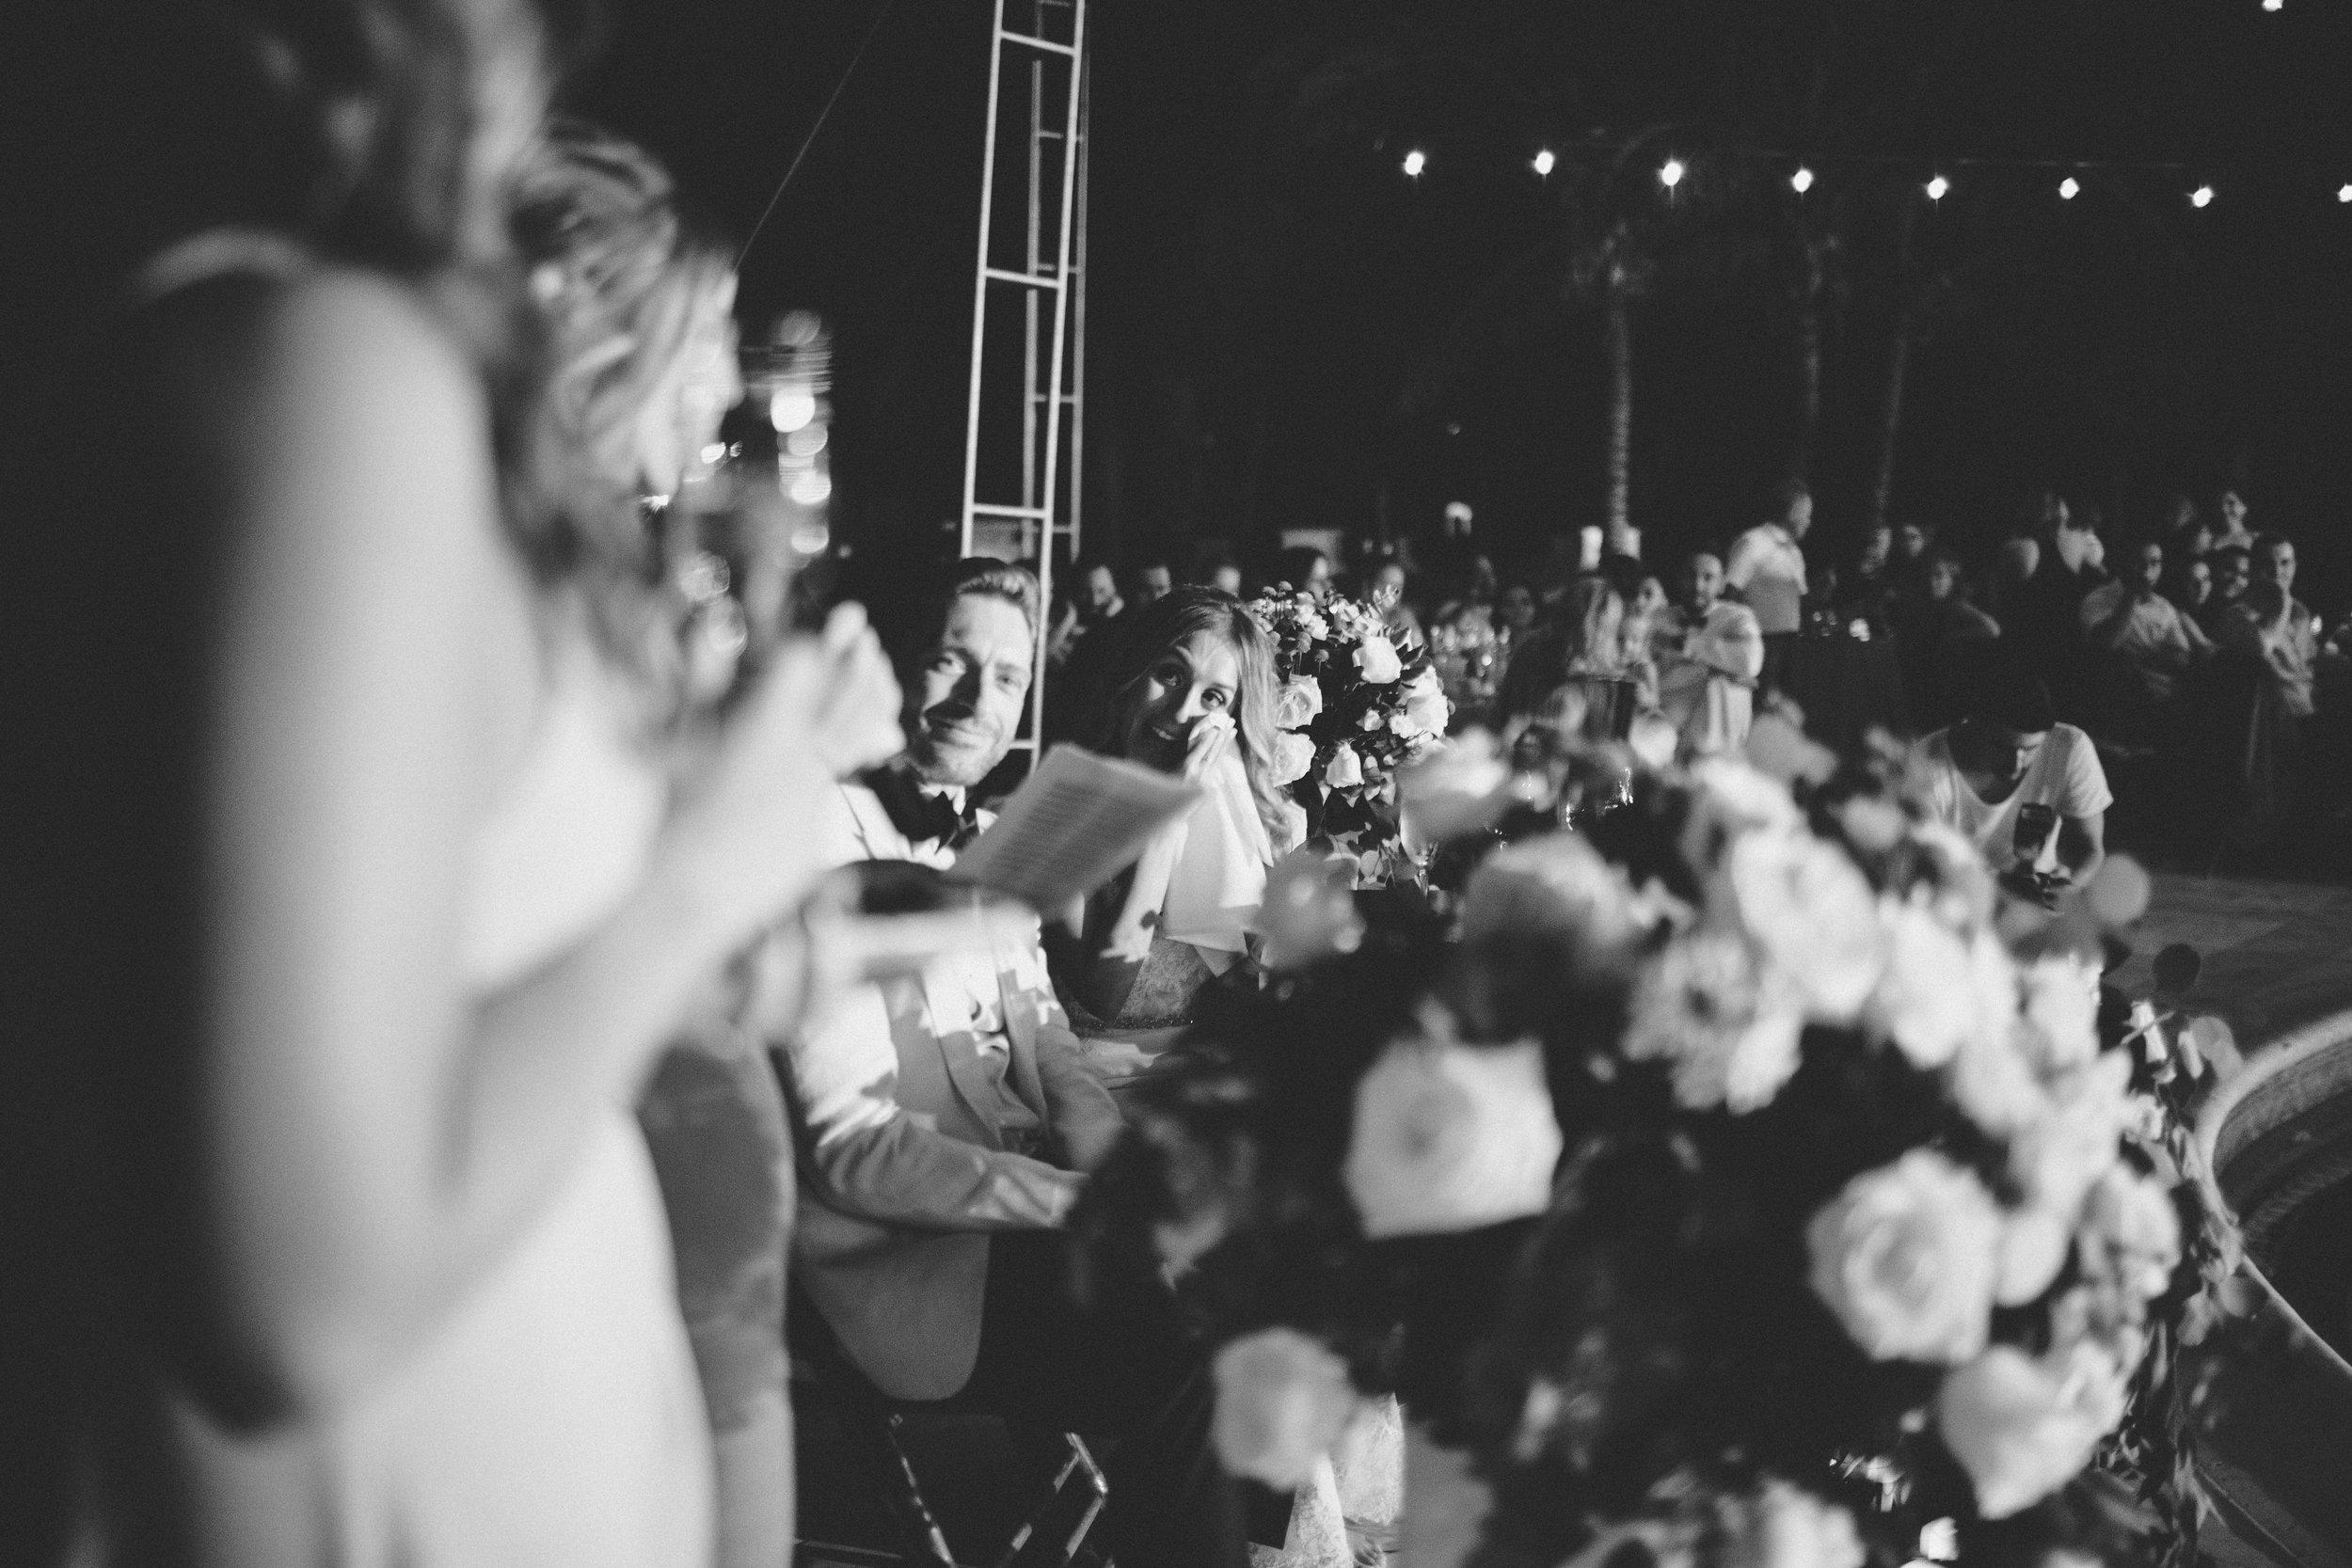 mexico_wedding_cancun_villa_la_joya_evangeline_lane_136.jpg